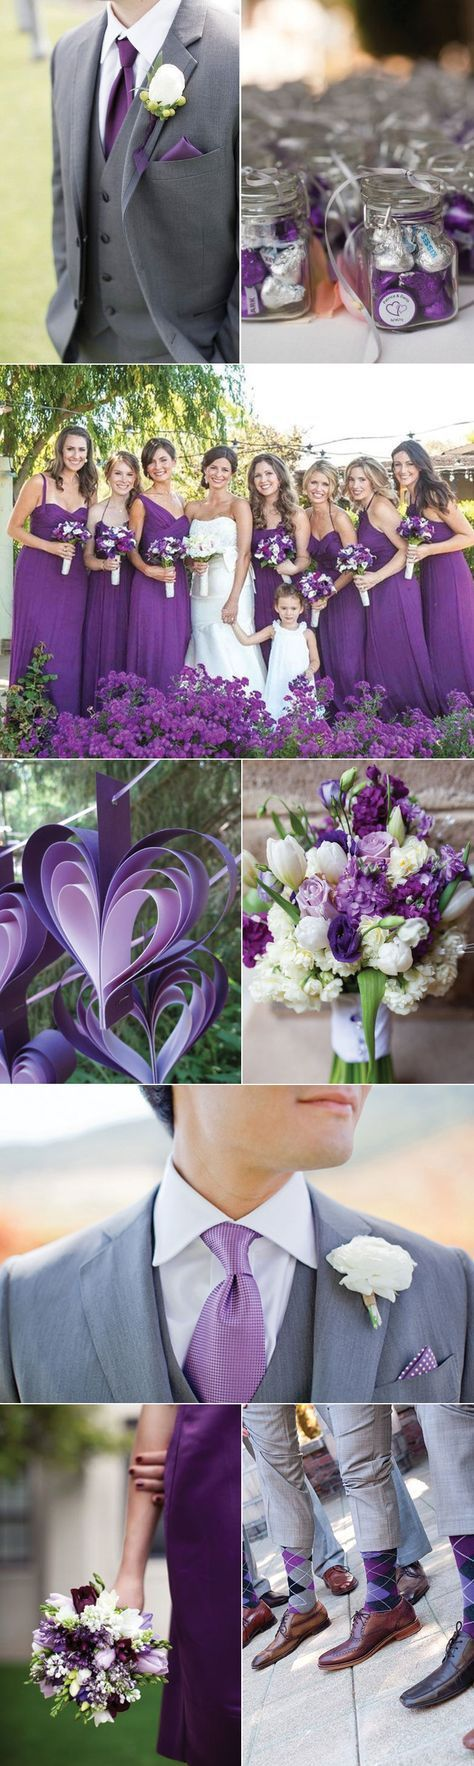 Bright Purple Bow Tie In 2020 Purple Wedding Wedding Colors